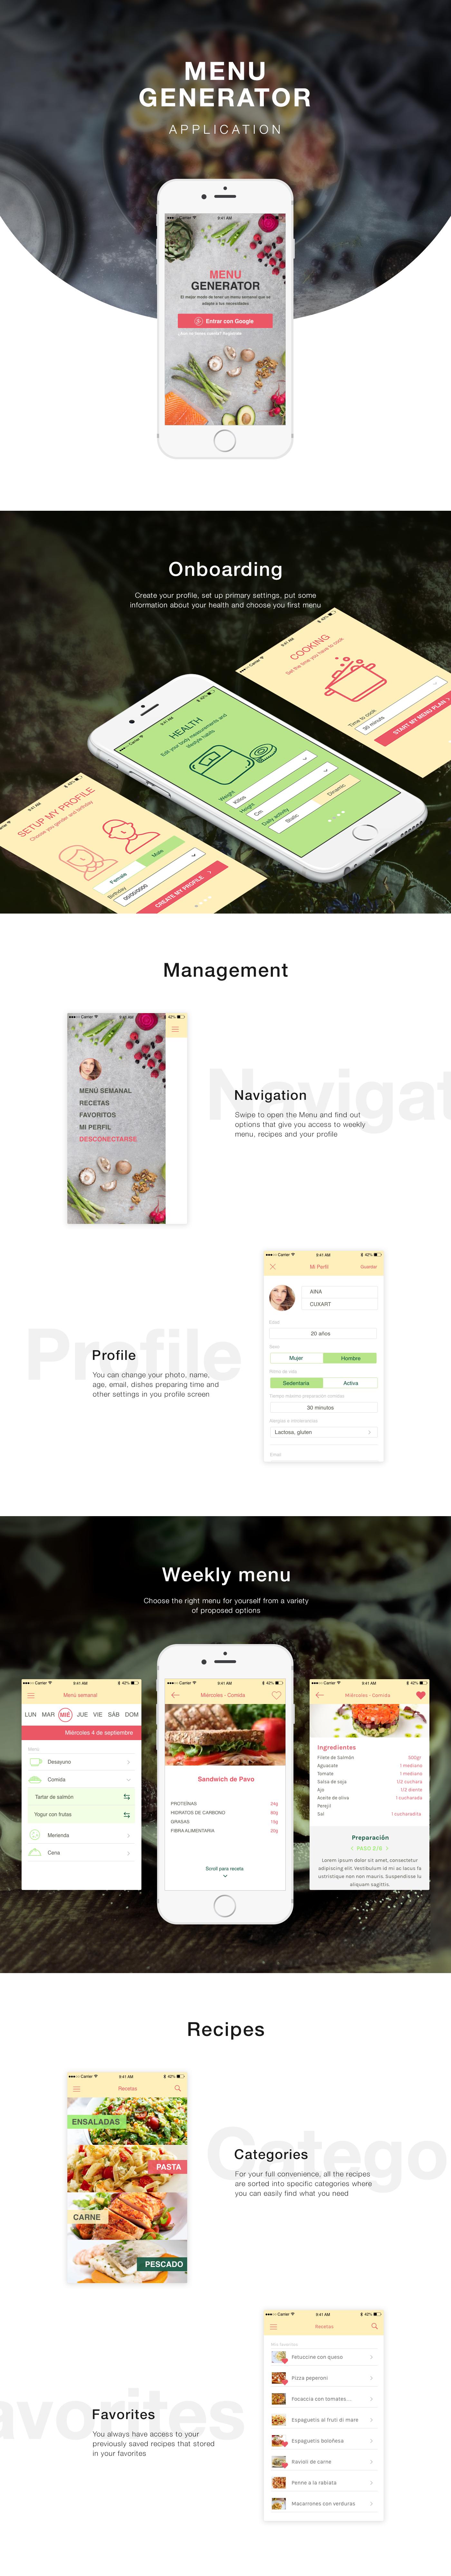 app ux UI design interactive design Food  Health